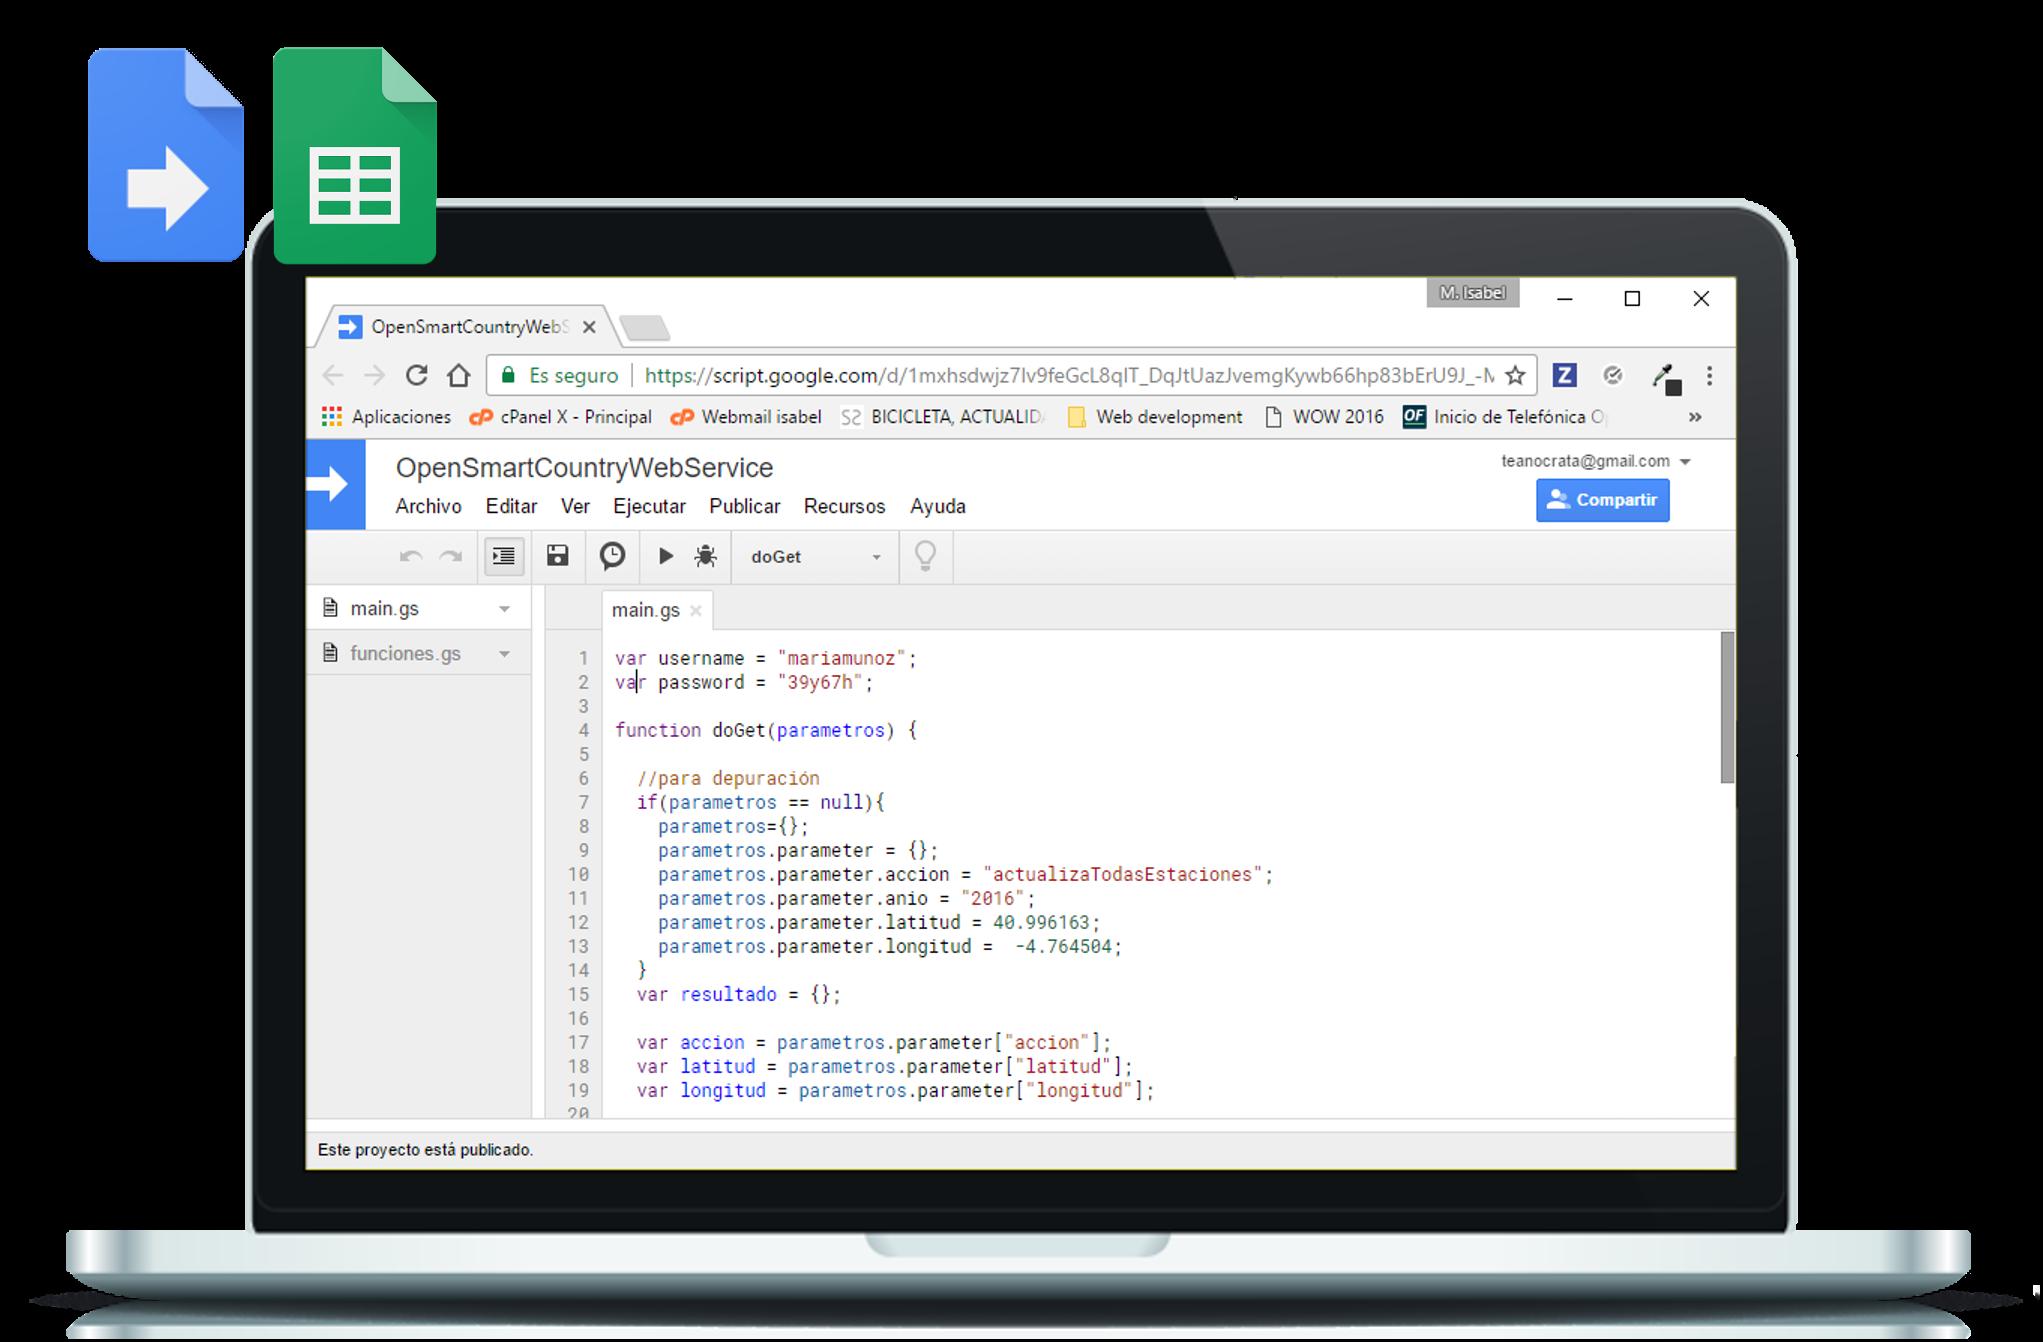 GooglAppsScripts - Several Google Apps Scripts